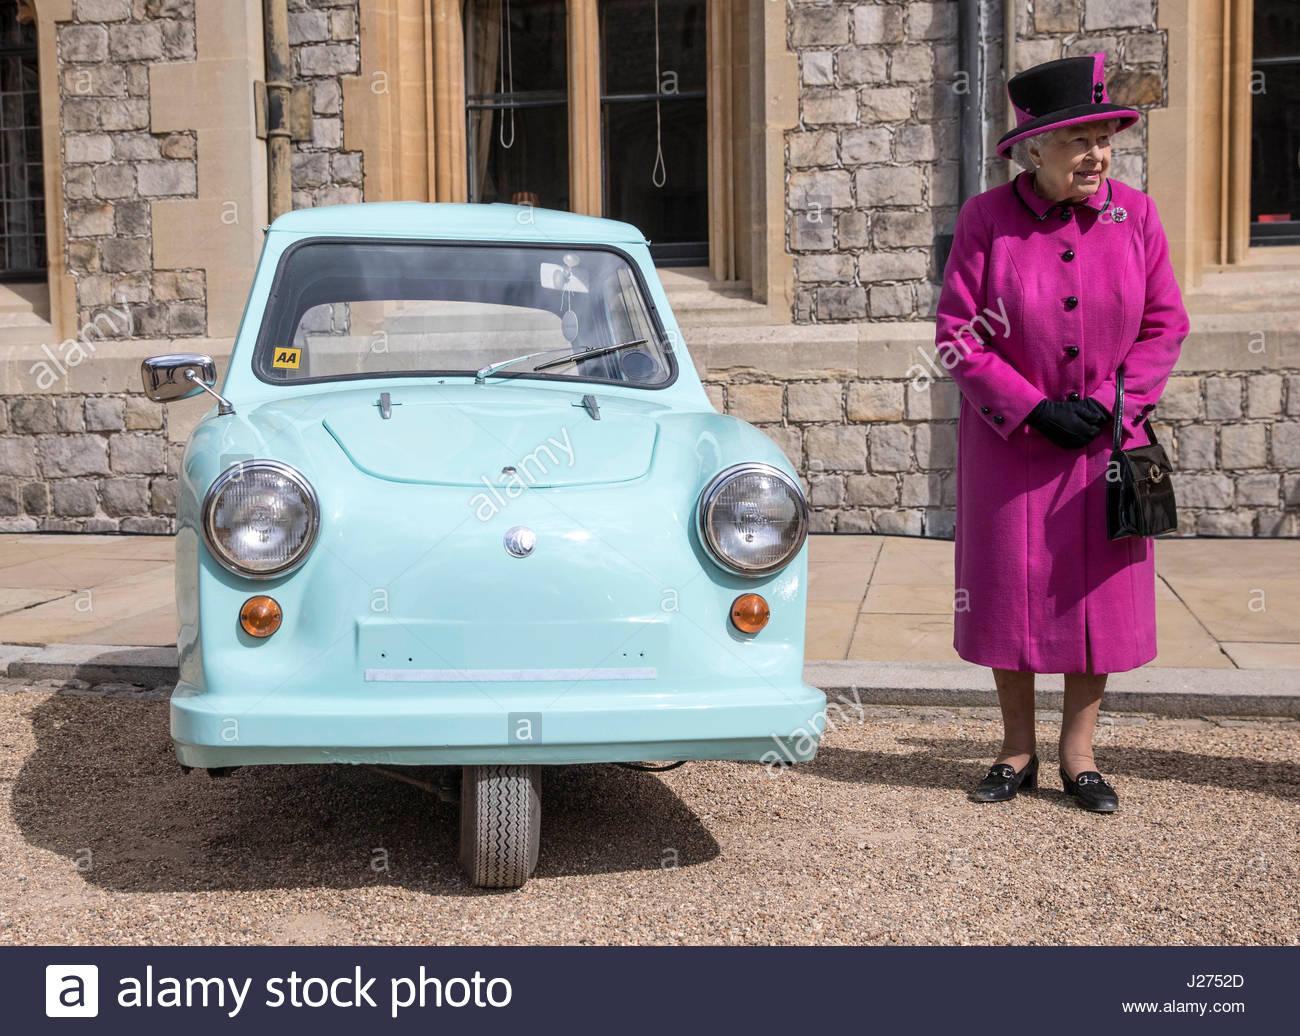 queen-elizabeth-ii-stands-next-to-a-classic-invacar-invalid-carriage-J2752D.jpg